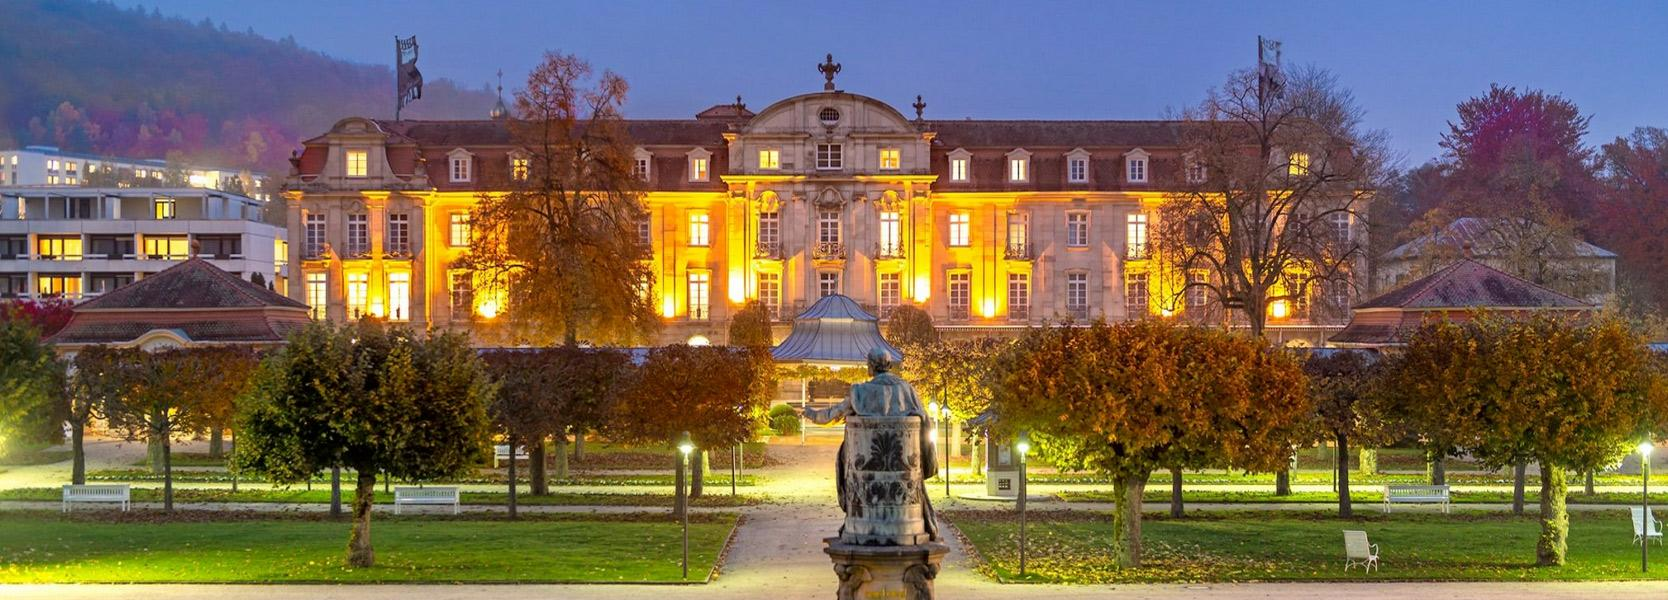 Bad Bruckenau Hotel Dorint Resort